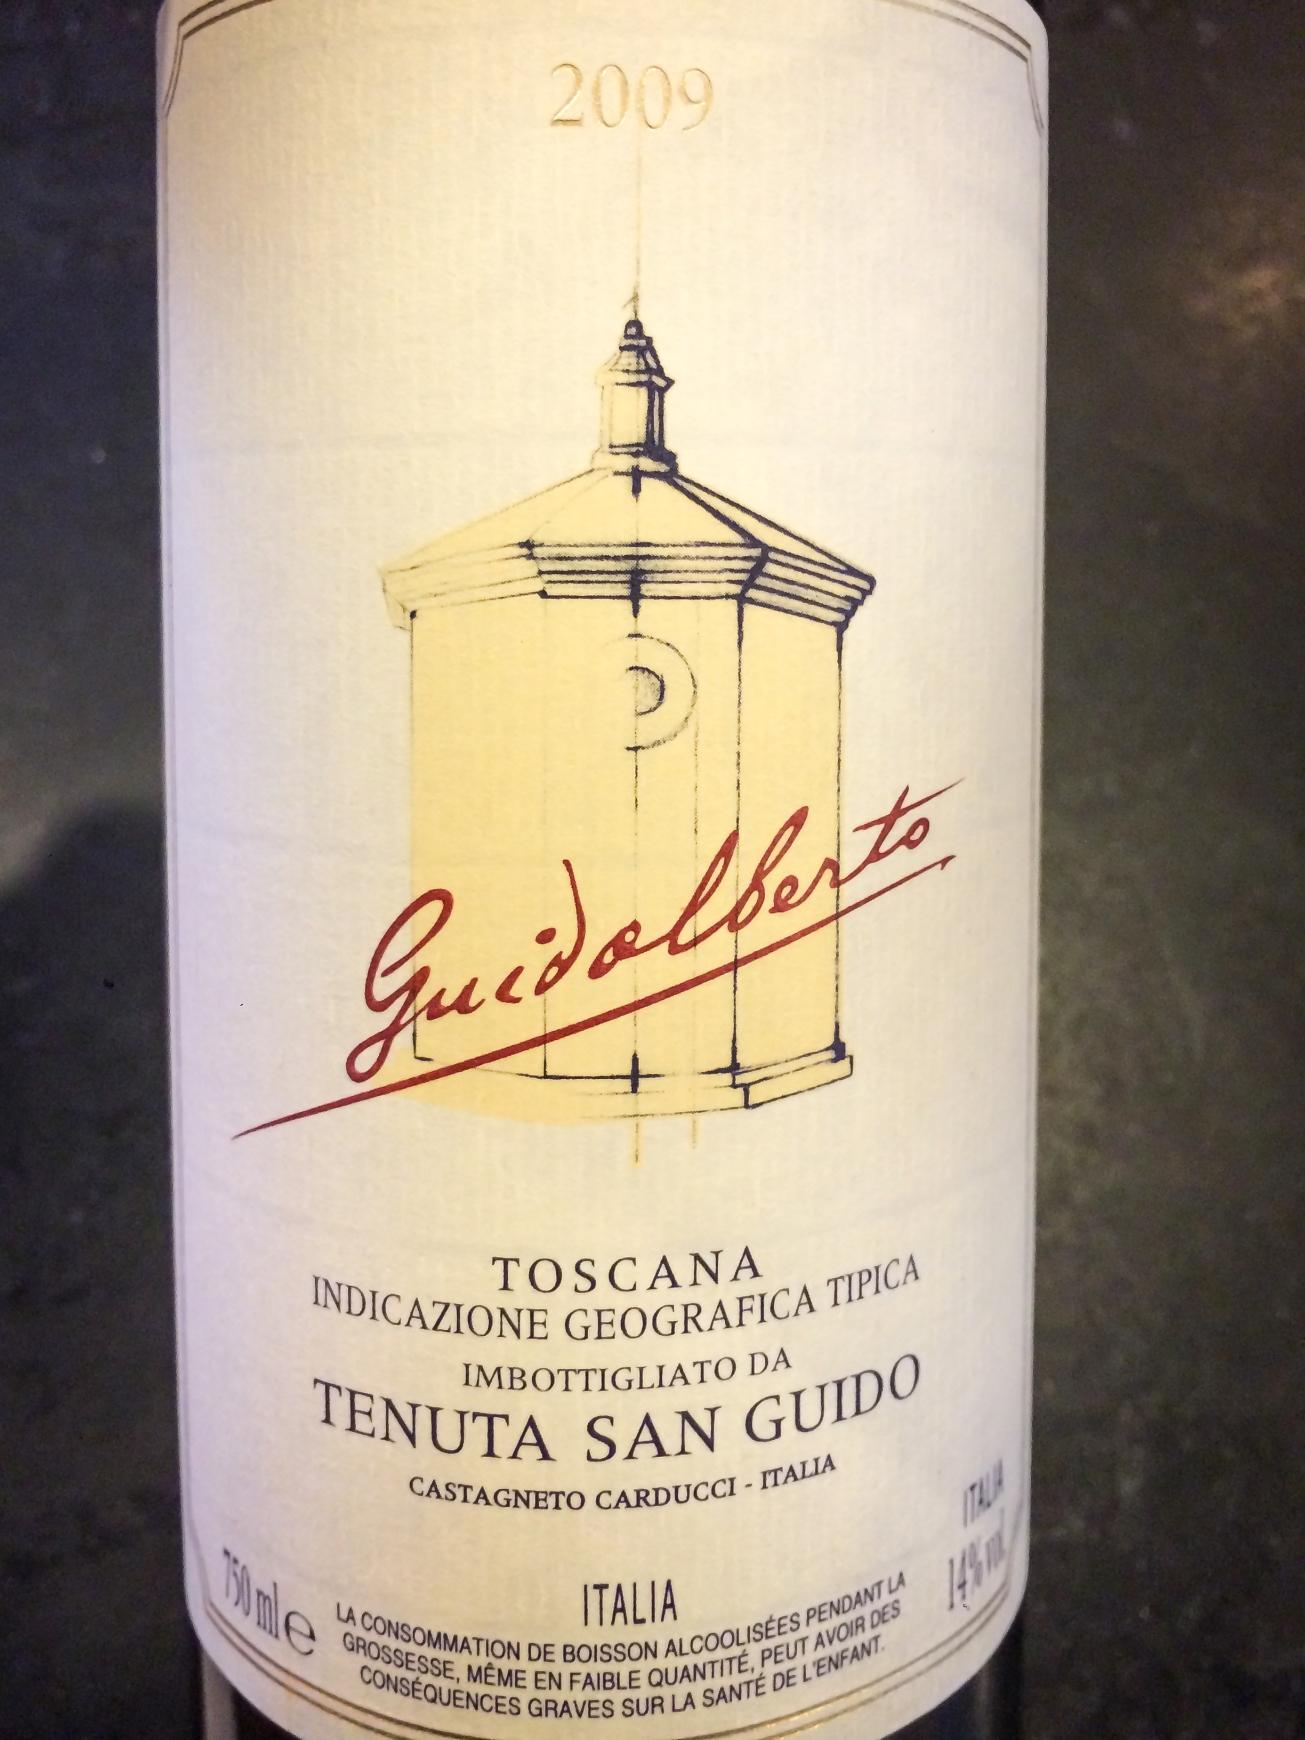 2009 Tenuta San Guido Guidalberto Toscana IGT